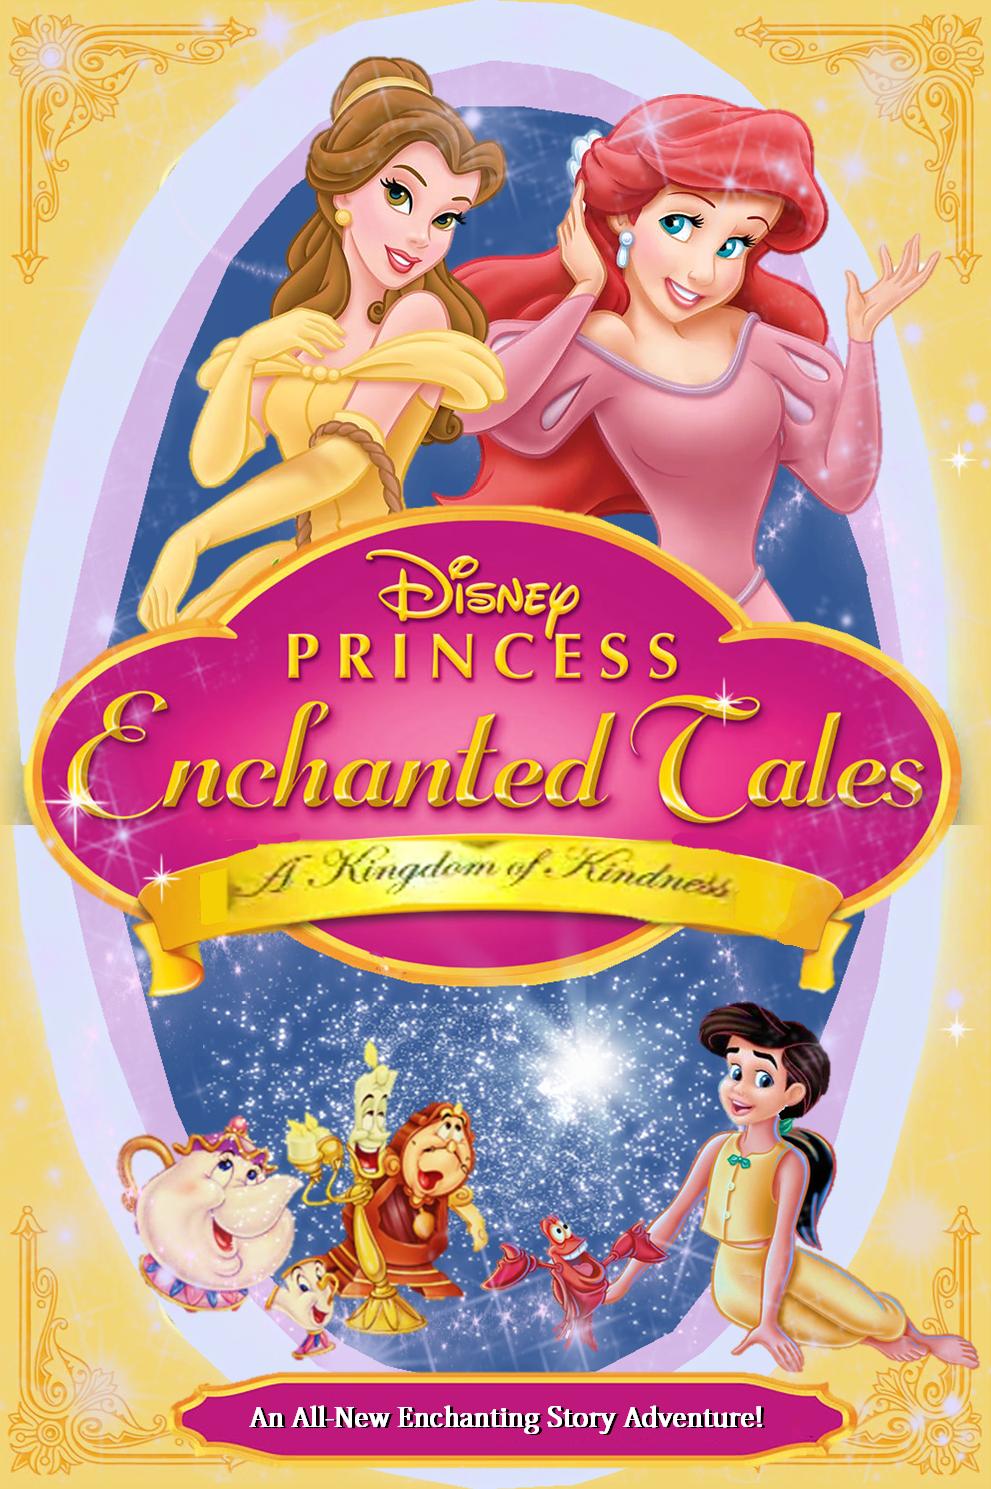 Disney Princess Enchanted Tales A Kingdom of Kindness